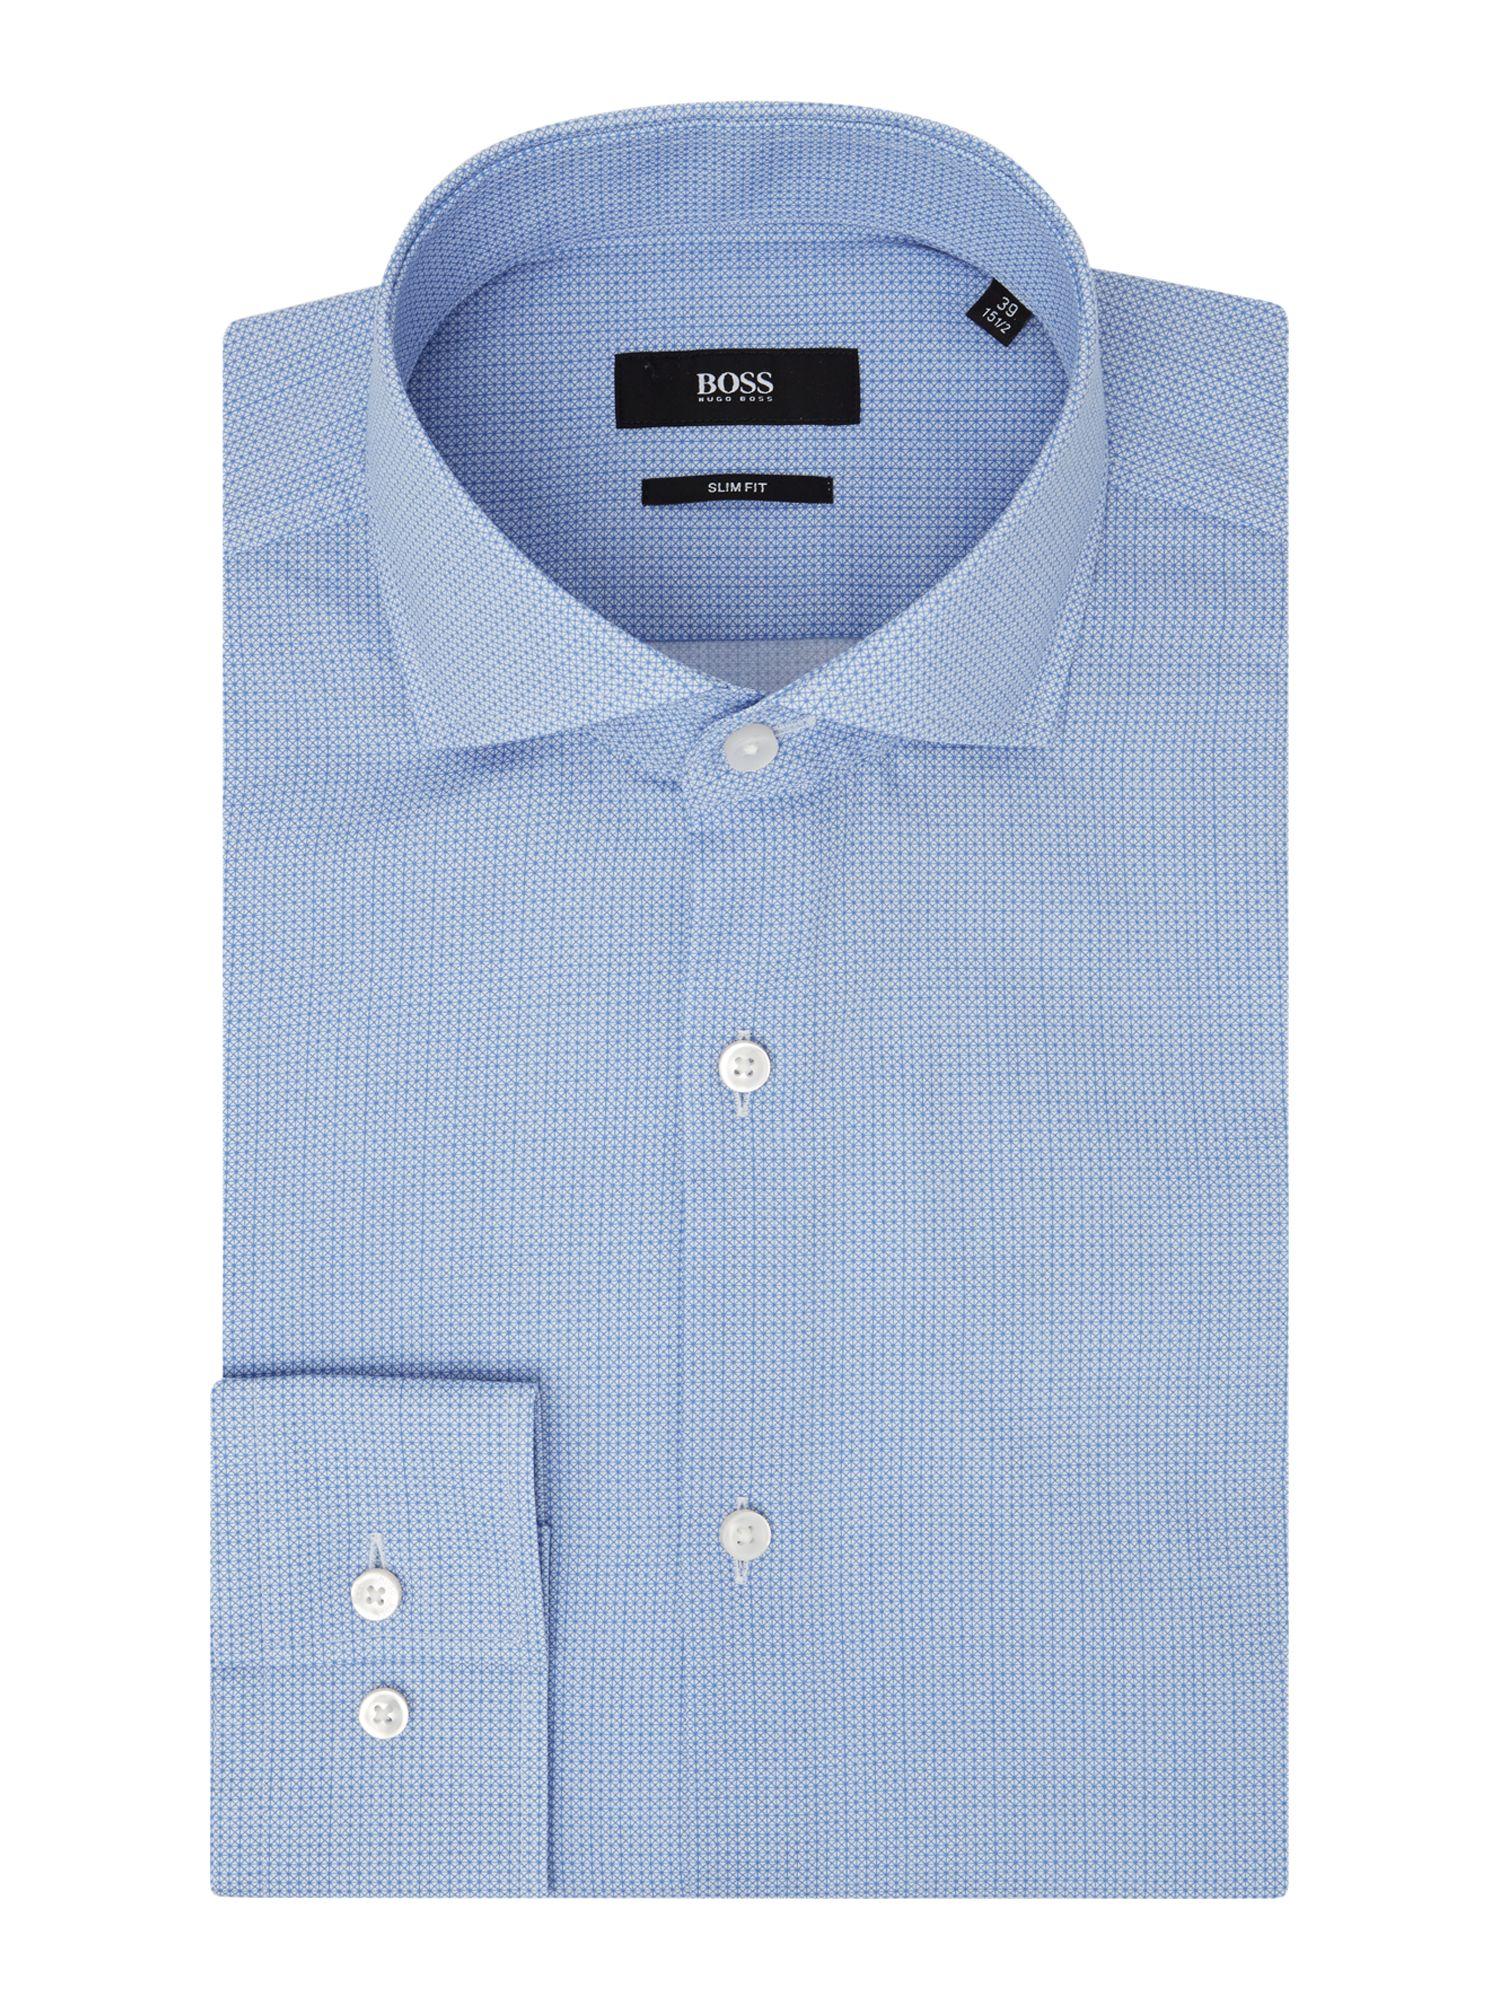 Lyst boss jason pattern slim fit long sleeve shirt in for Hugo boss jason shirt